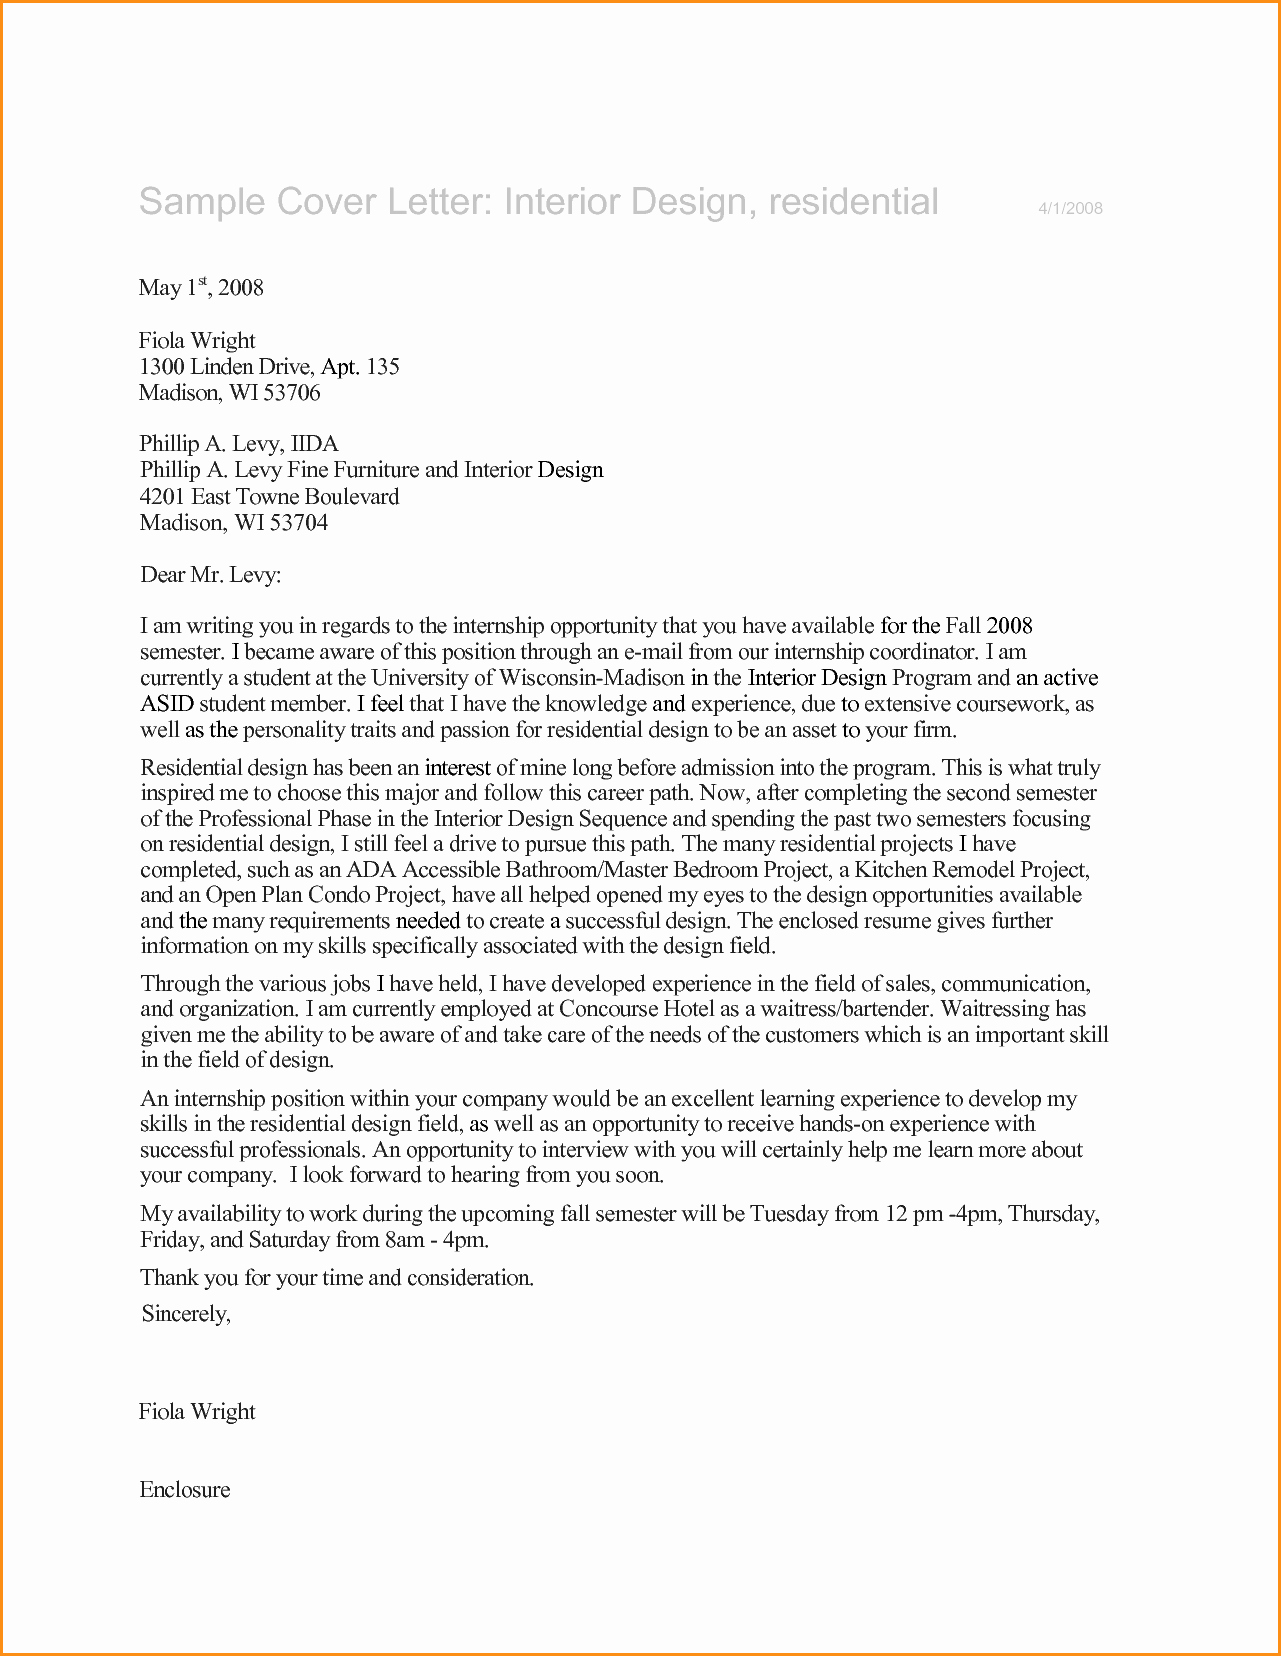 7 Graphic Design Internship Cover Letter